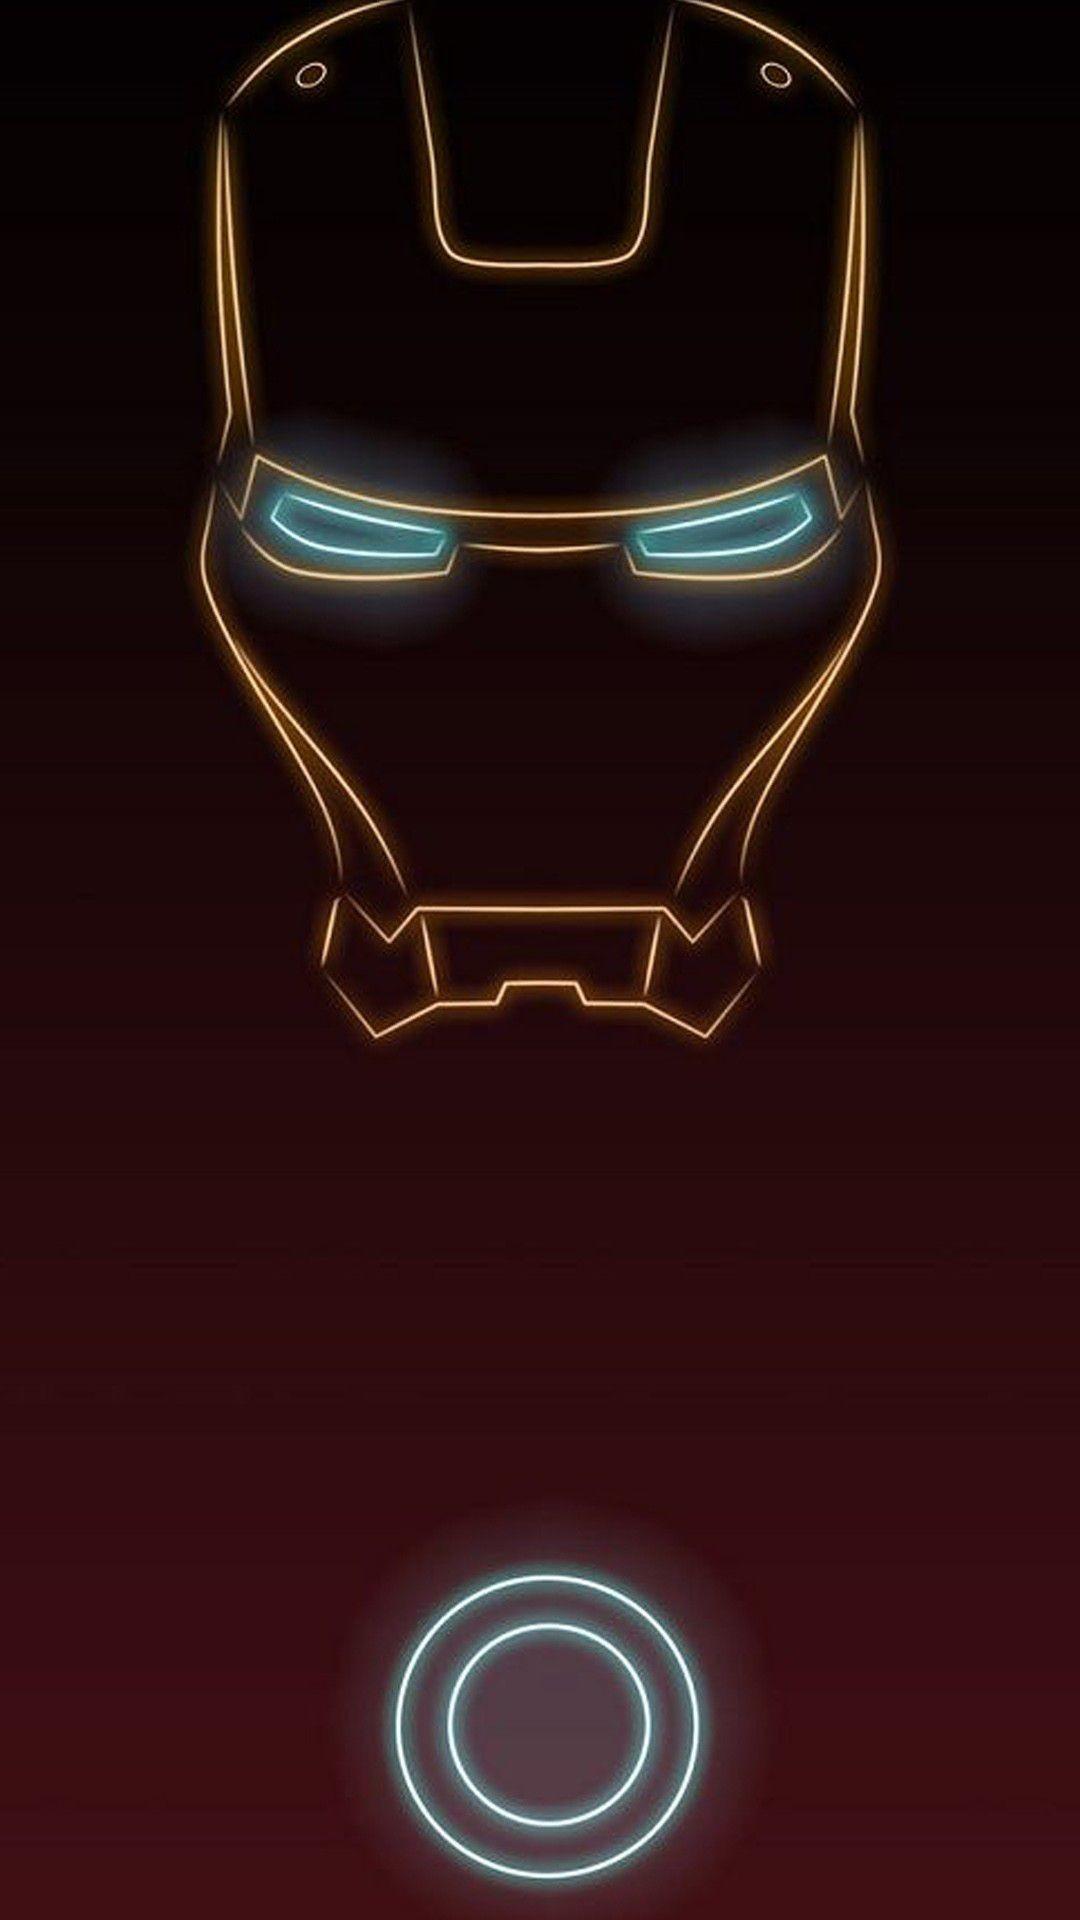 Iron Man Wallpaper Iphone 93 Images